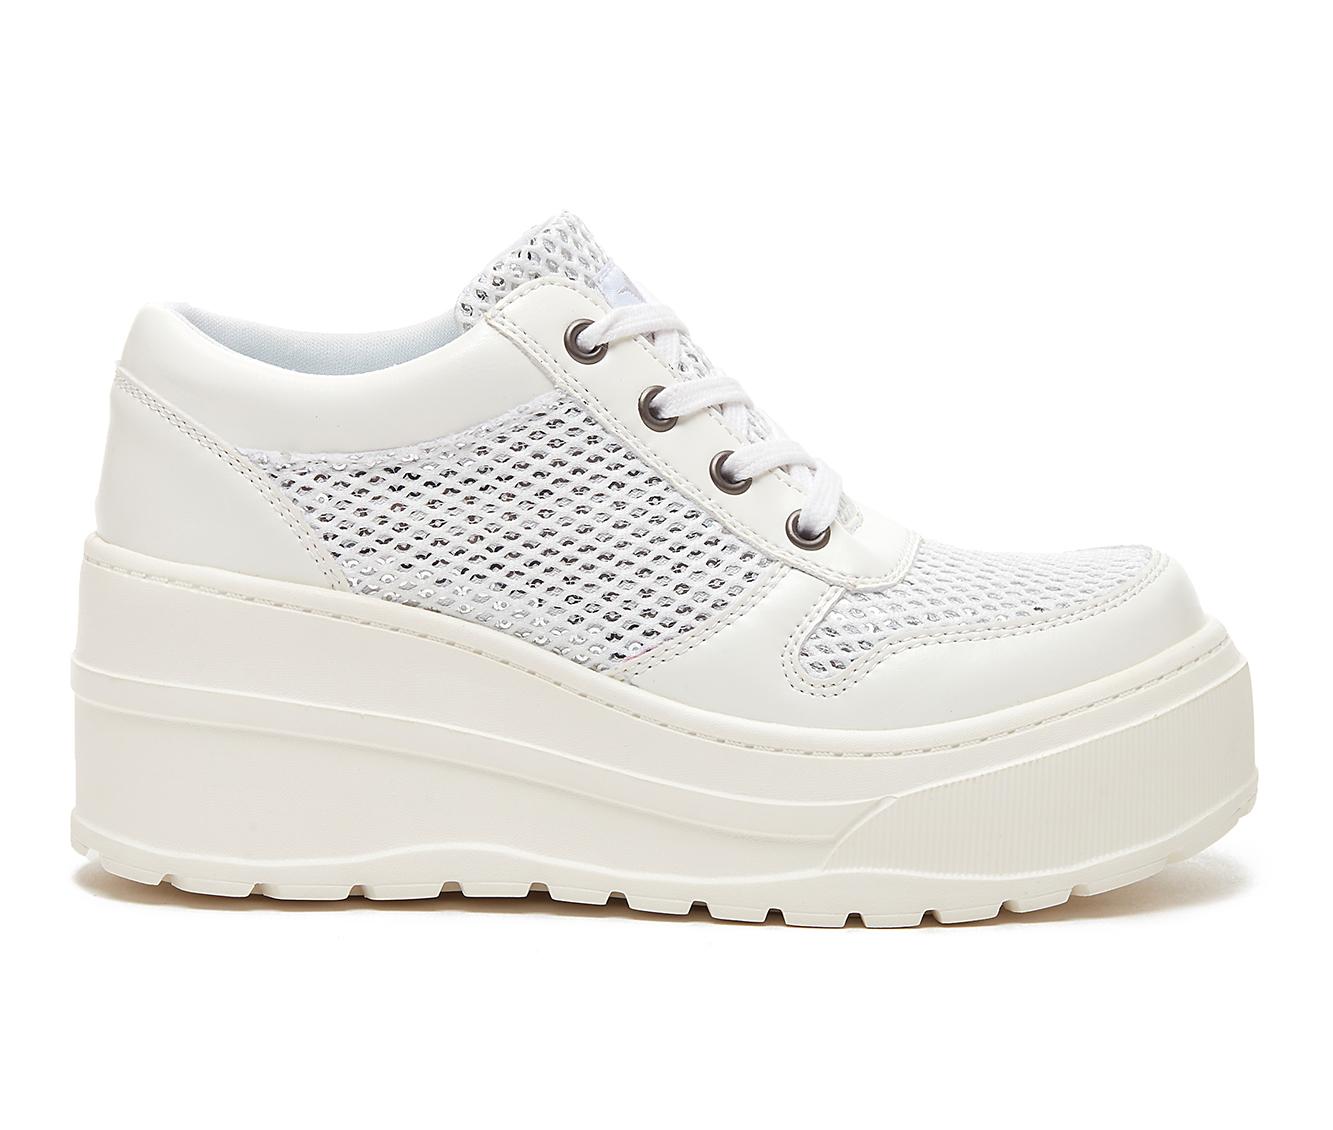 Rocket Dog Cosmic Women's Shoe (White Faux Leather)